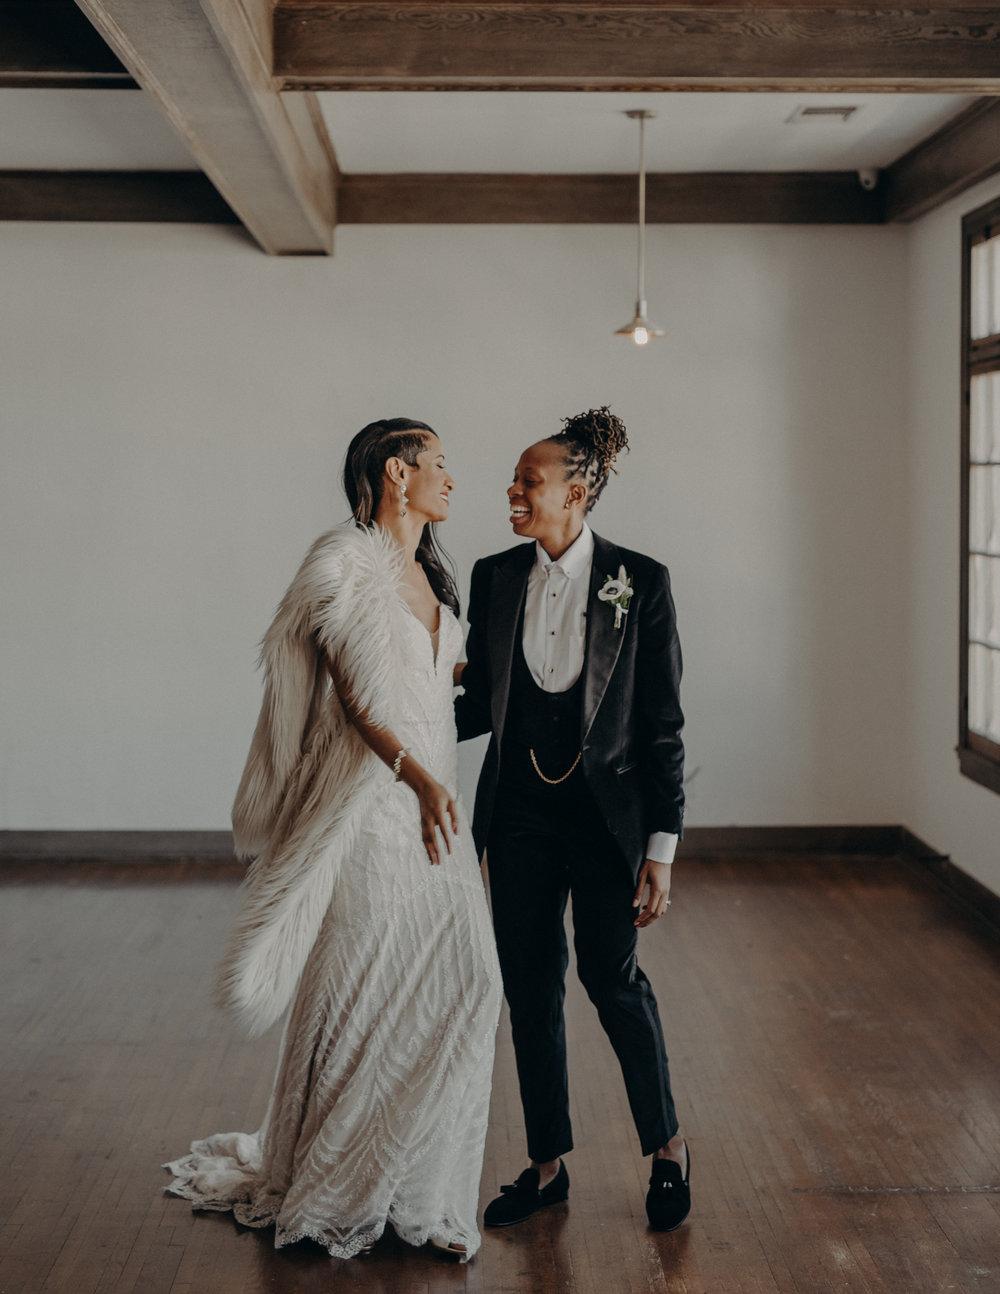 Wedding Photographer in Los Angeles - Ebell of Long Beach Wedding - LGBTQ weddings - lesbian wedding - IsaiahAndTaylor.com-036.jpg